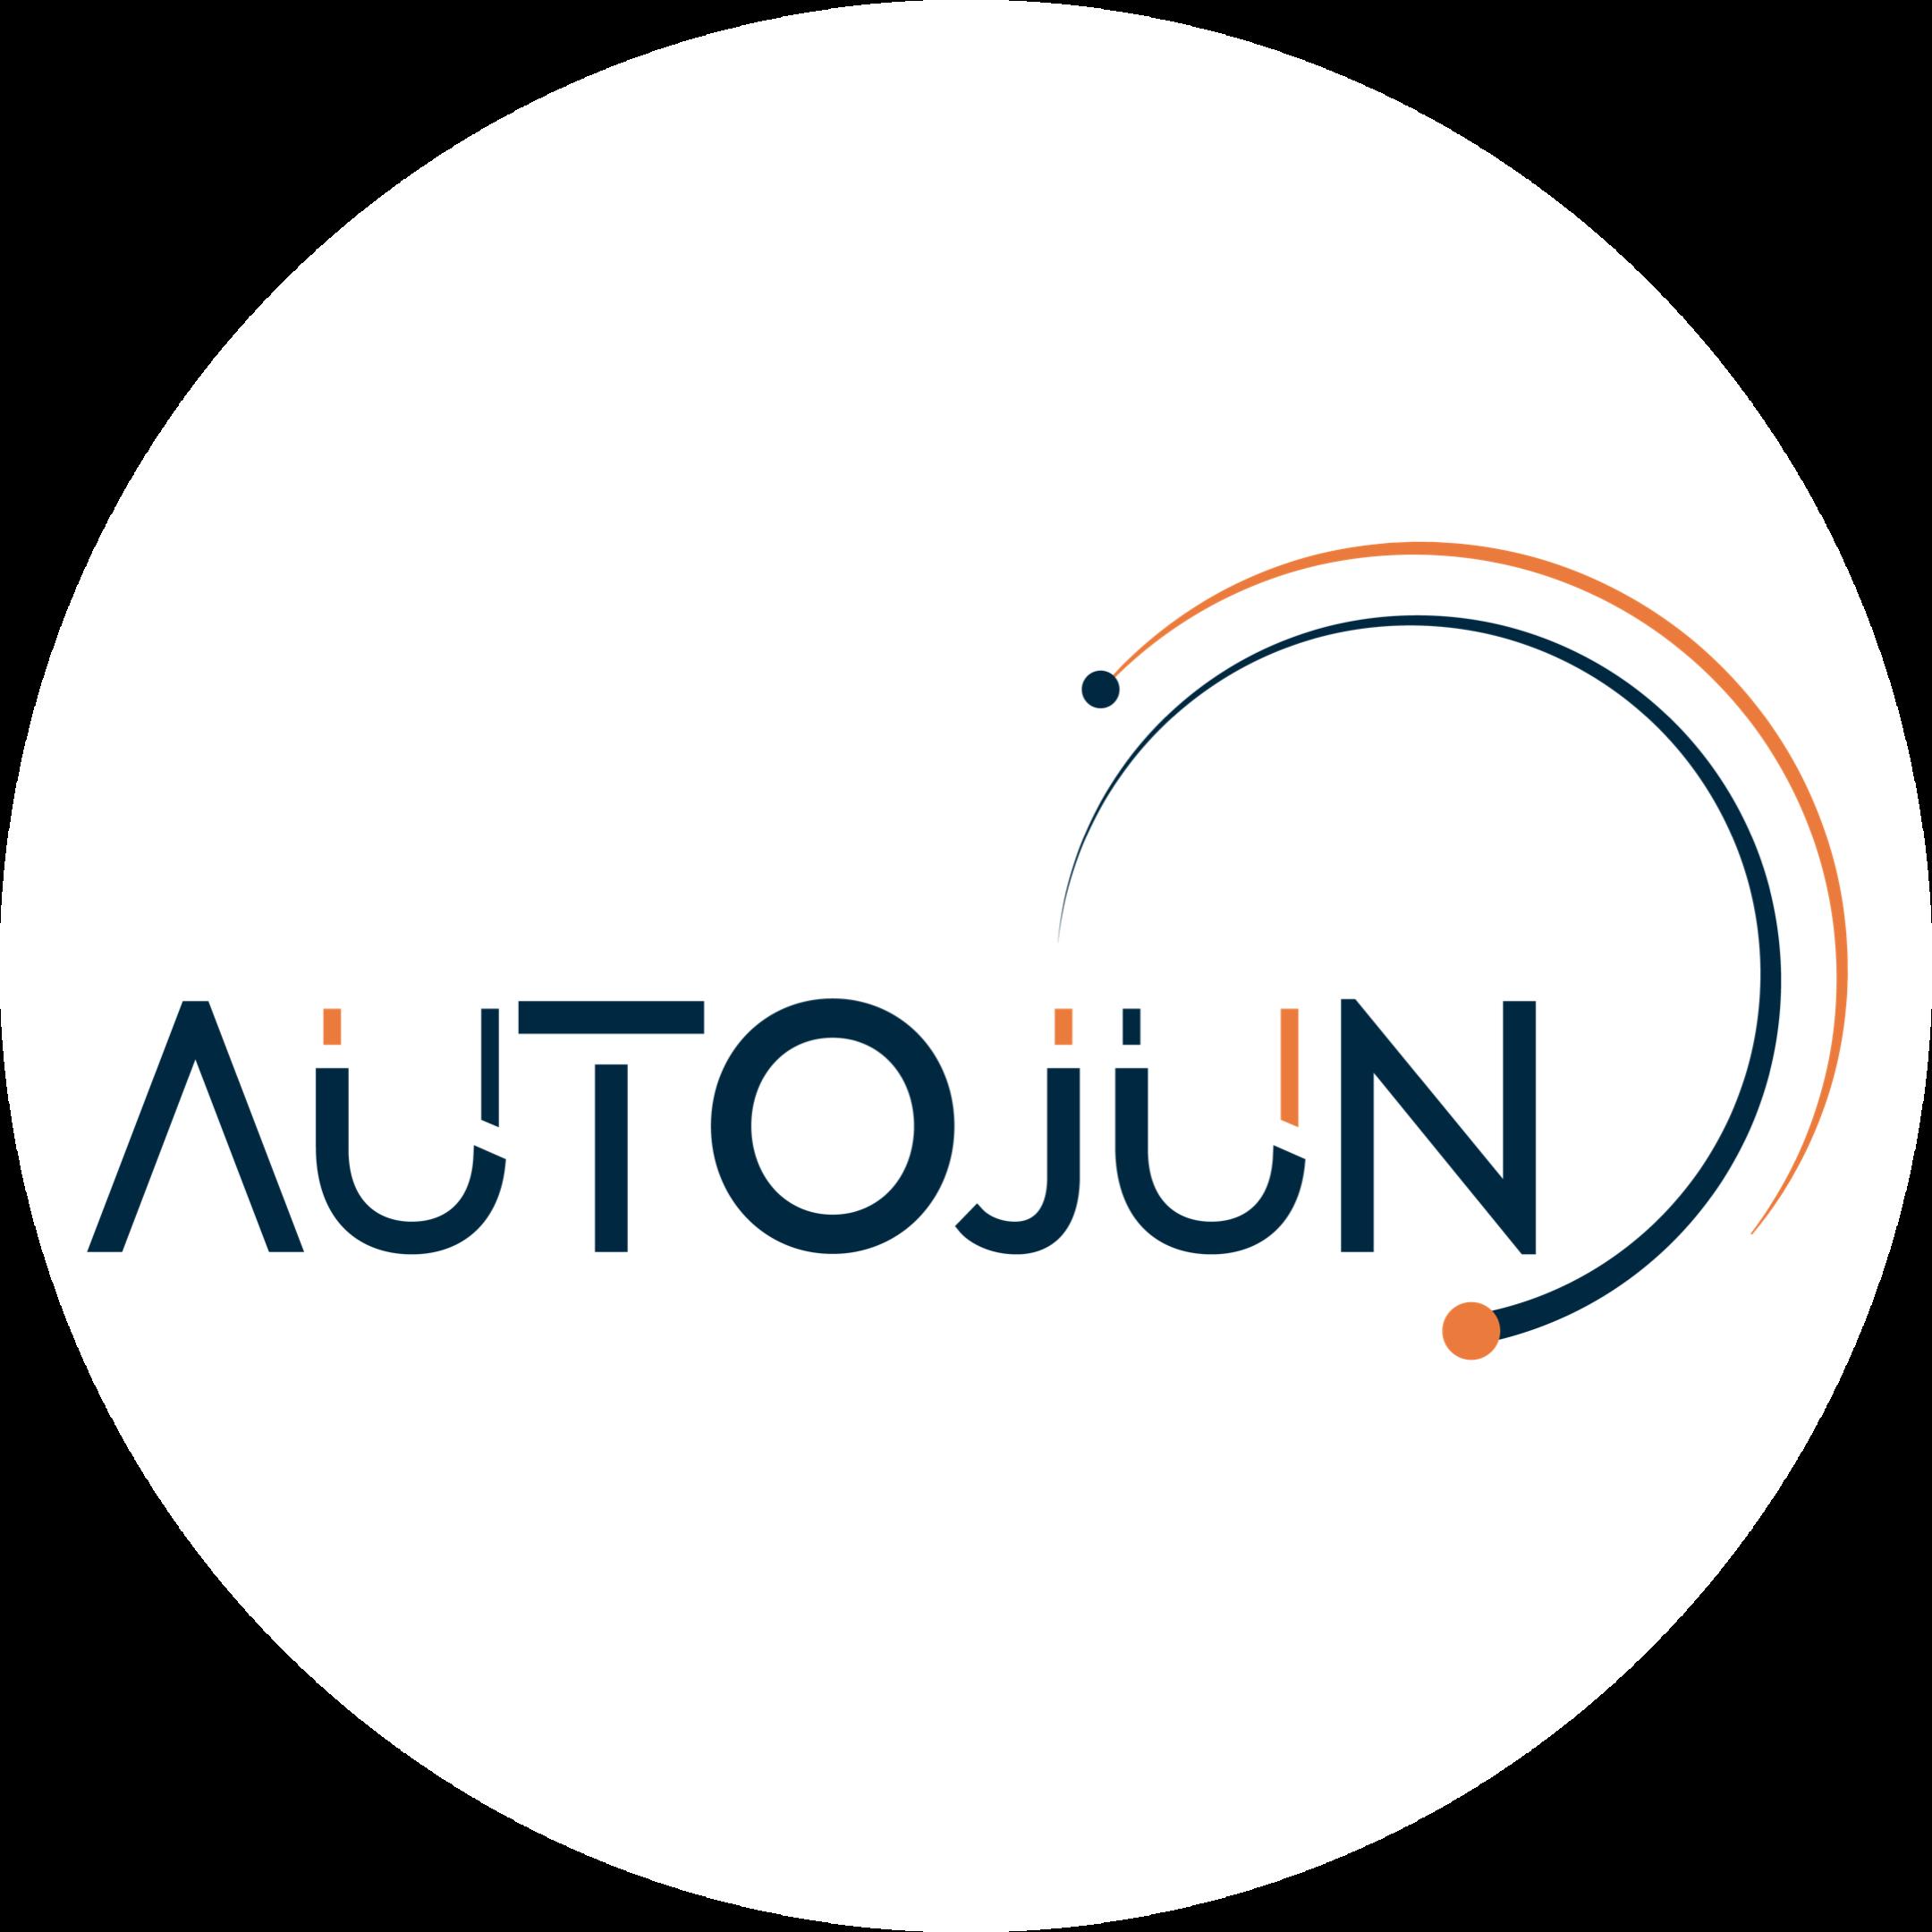 @autojunufsc Profile Image | Linktree